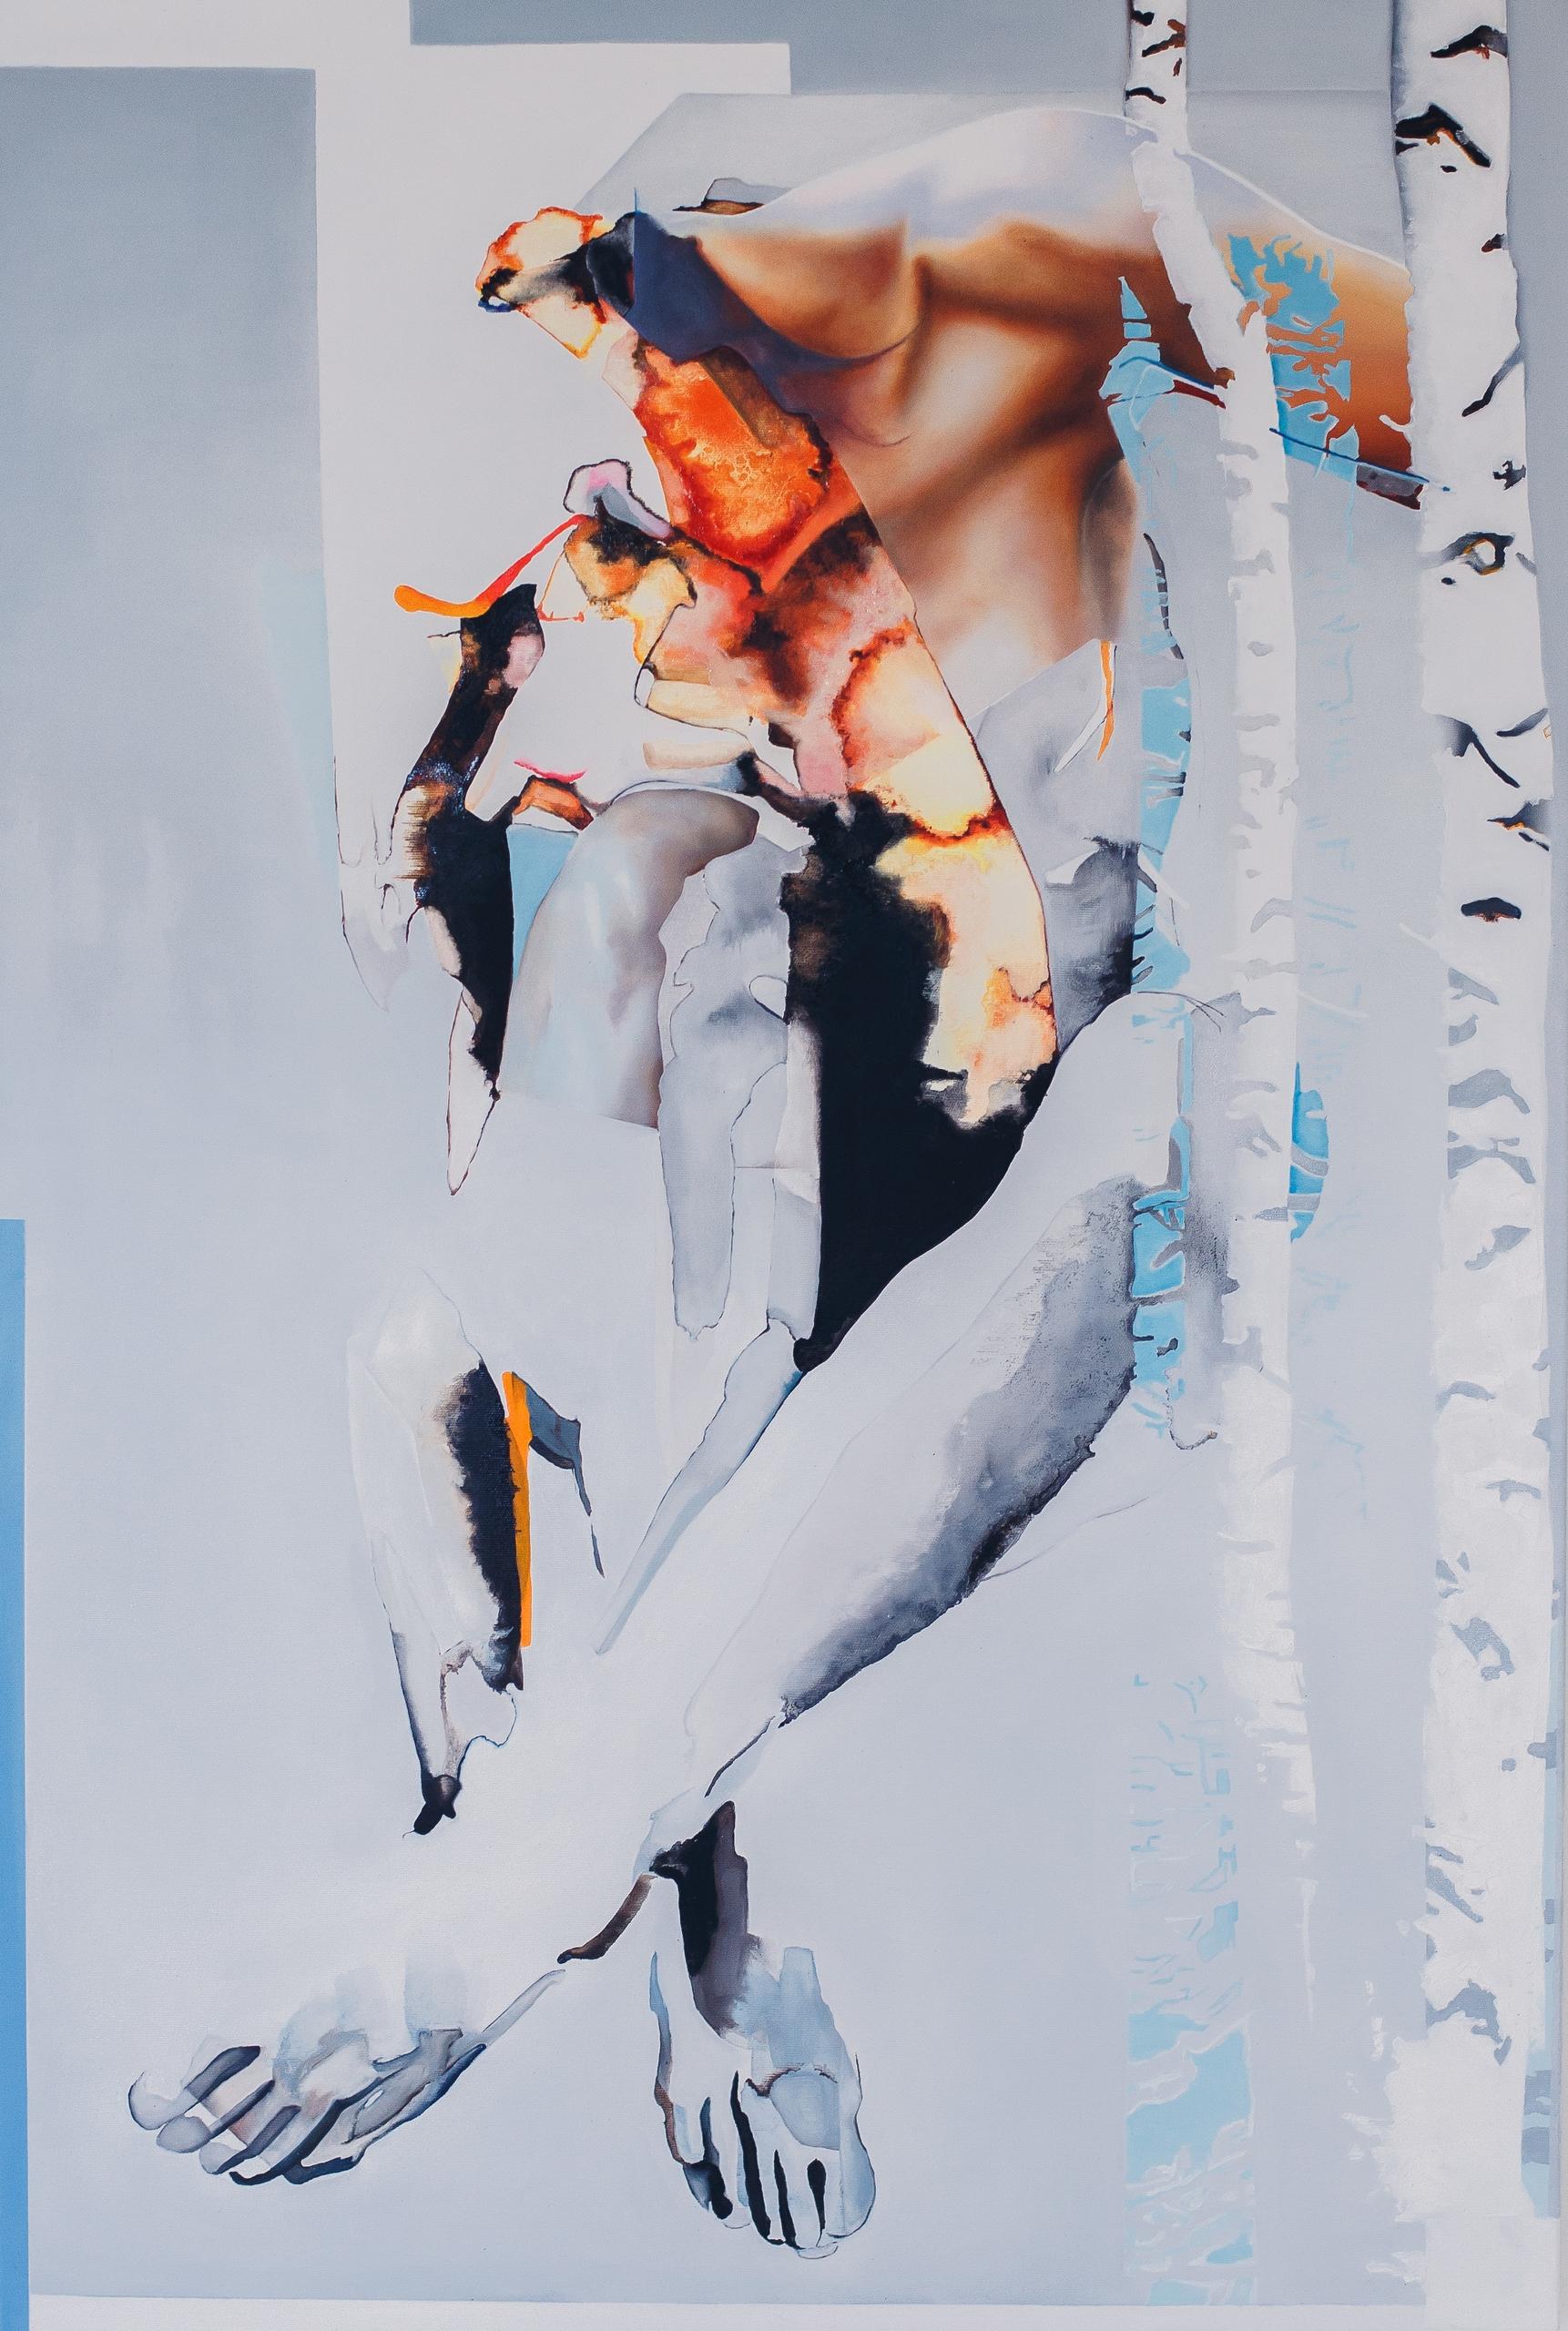 Brzezina - painting, oilpainting - zdzichowska | ello